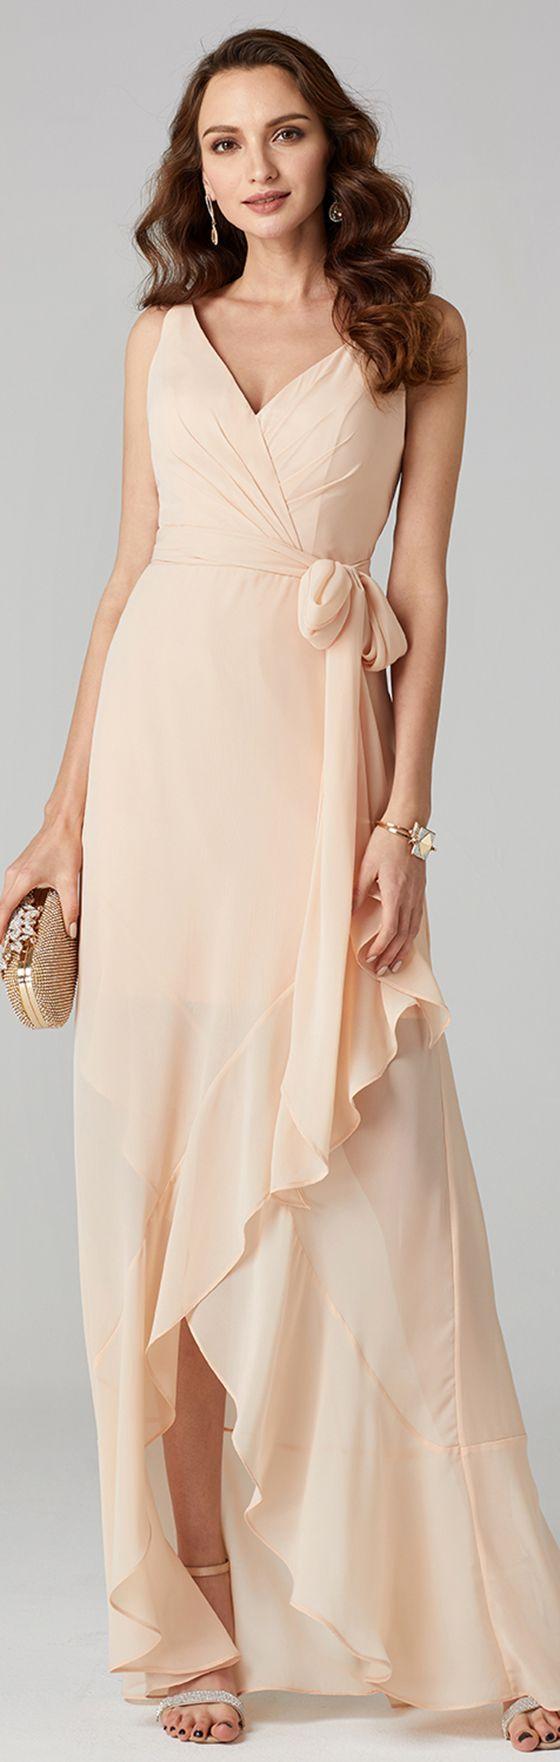 [$129.99] Ball Gown V Neck Asymmetrical Chiffon Cocktail ...